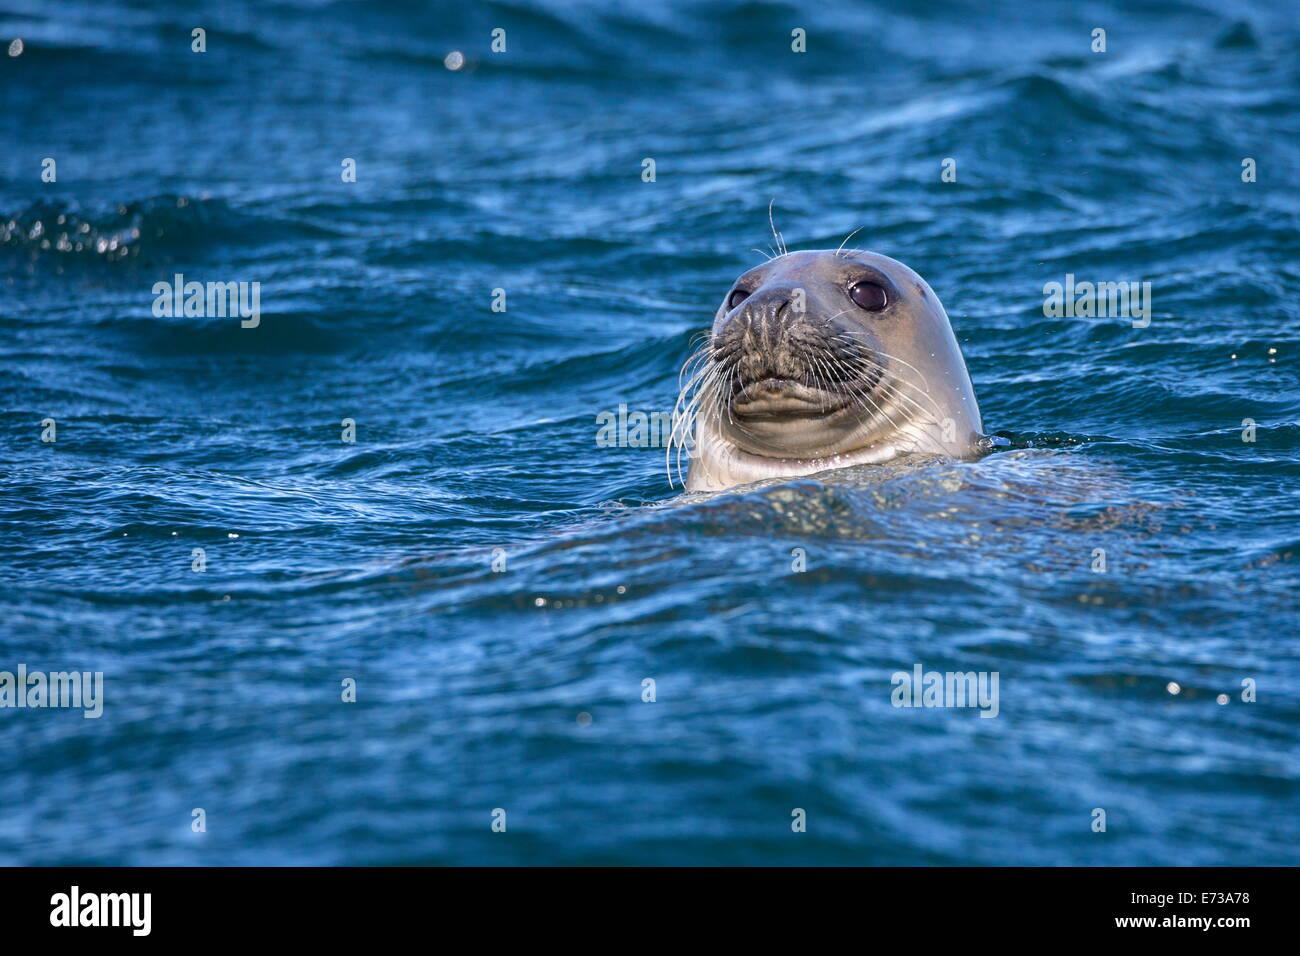 Grey seal (Halichoerus grypus) swimming, Farne Islands, Seahouses, Northumberland, England, United Kingdom, Europe Stock Photo